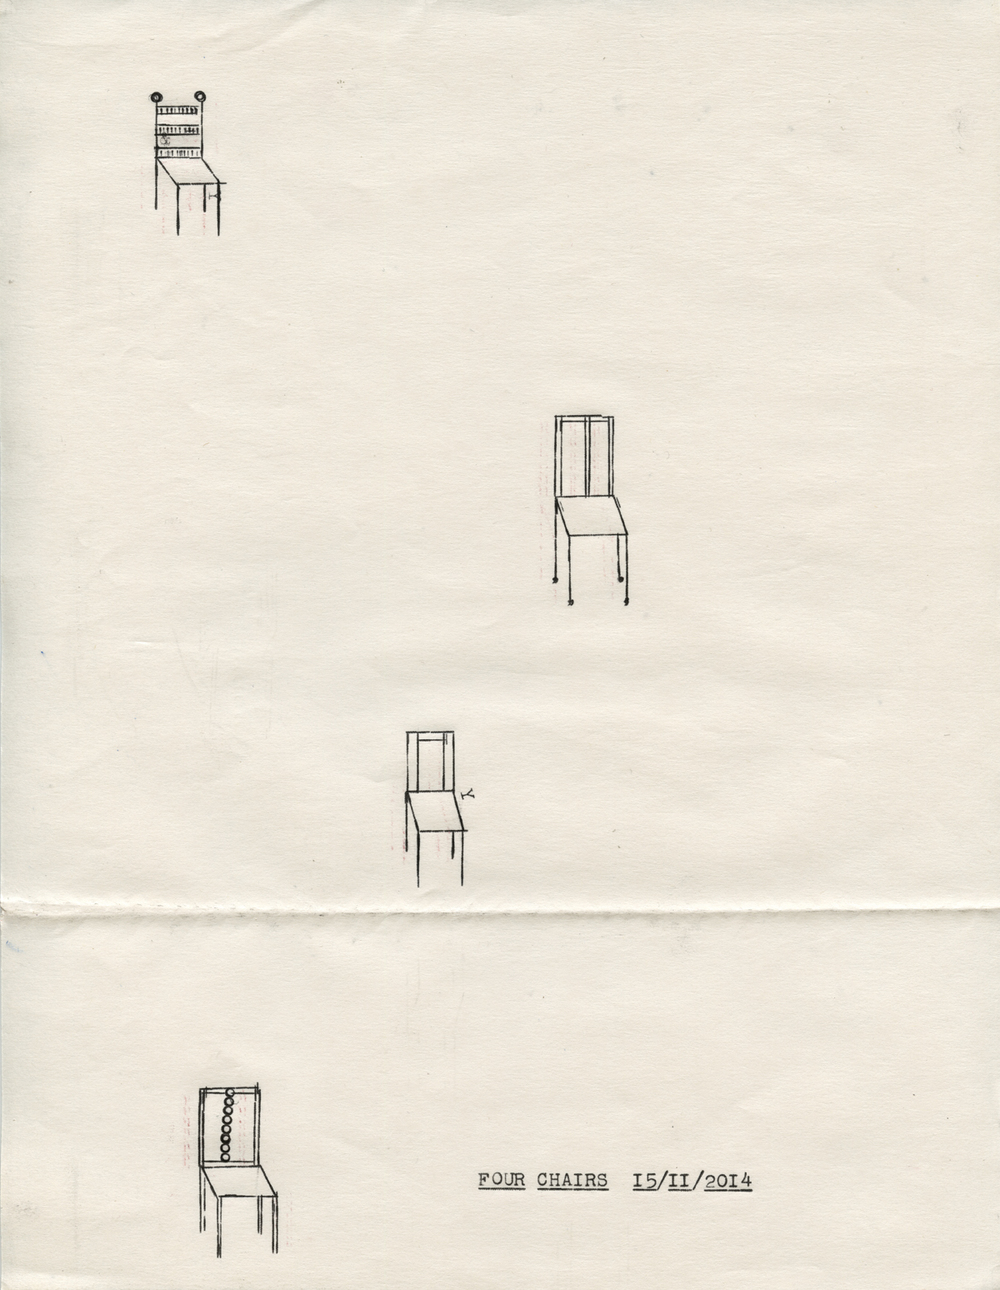 tw_15_11_2014_four_chairs.jpg